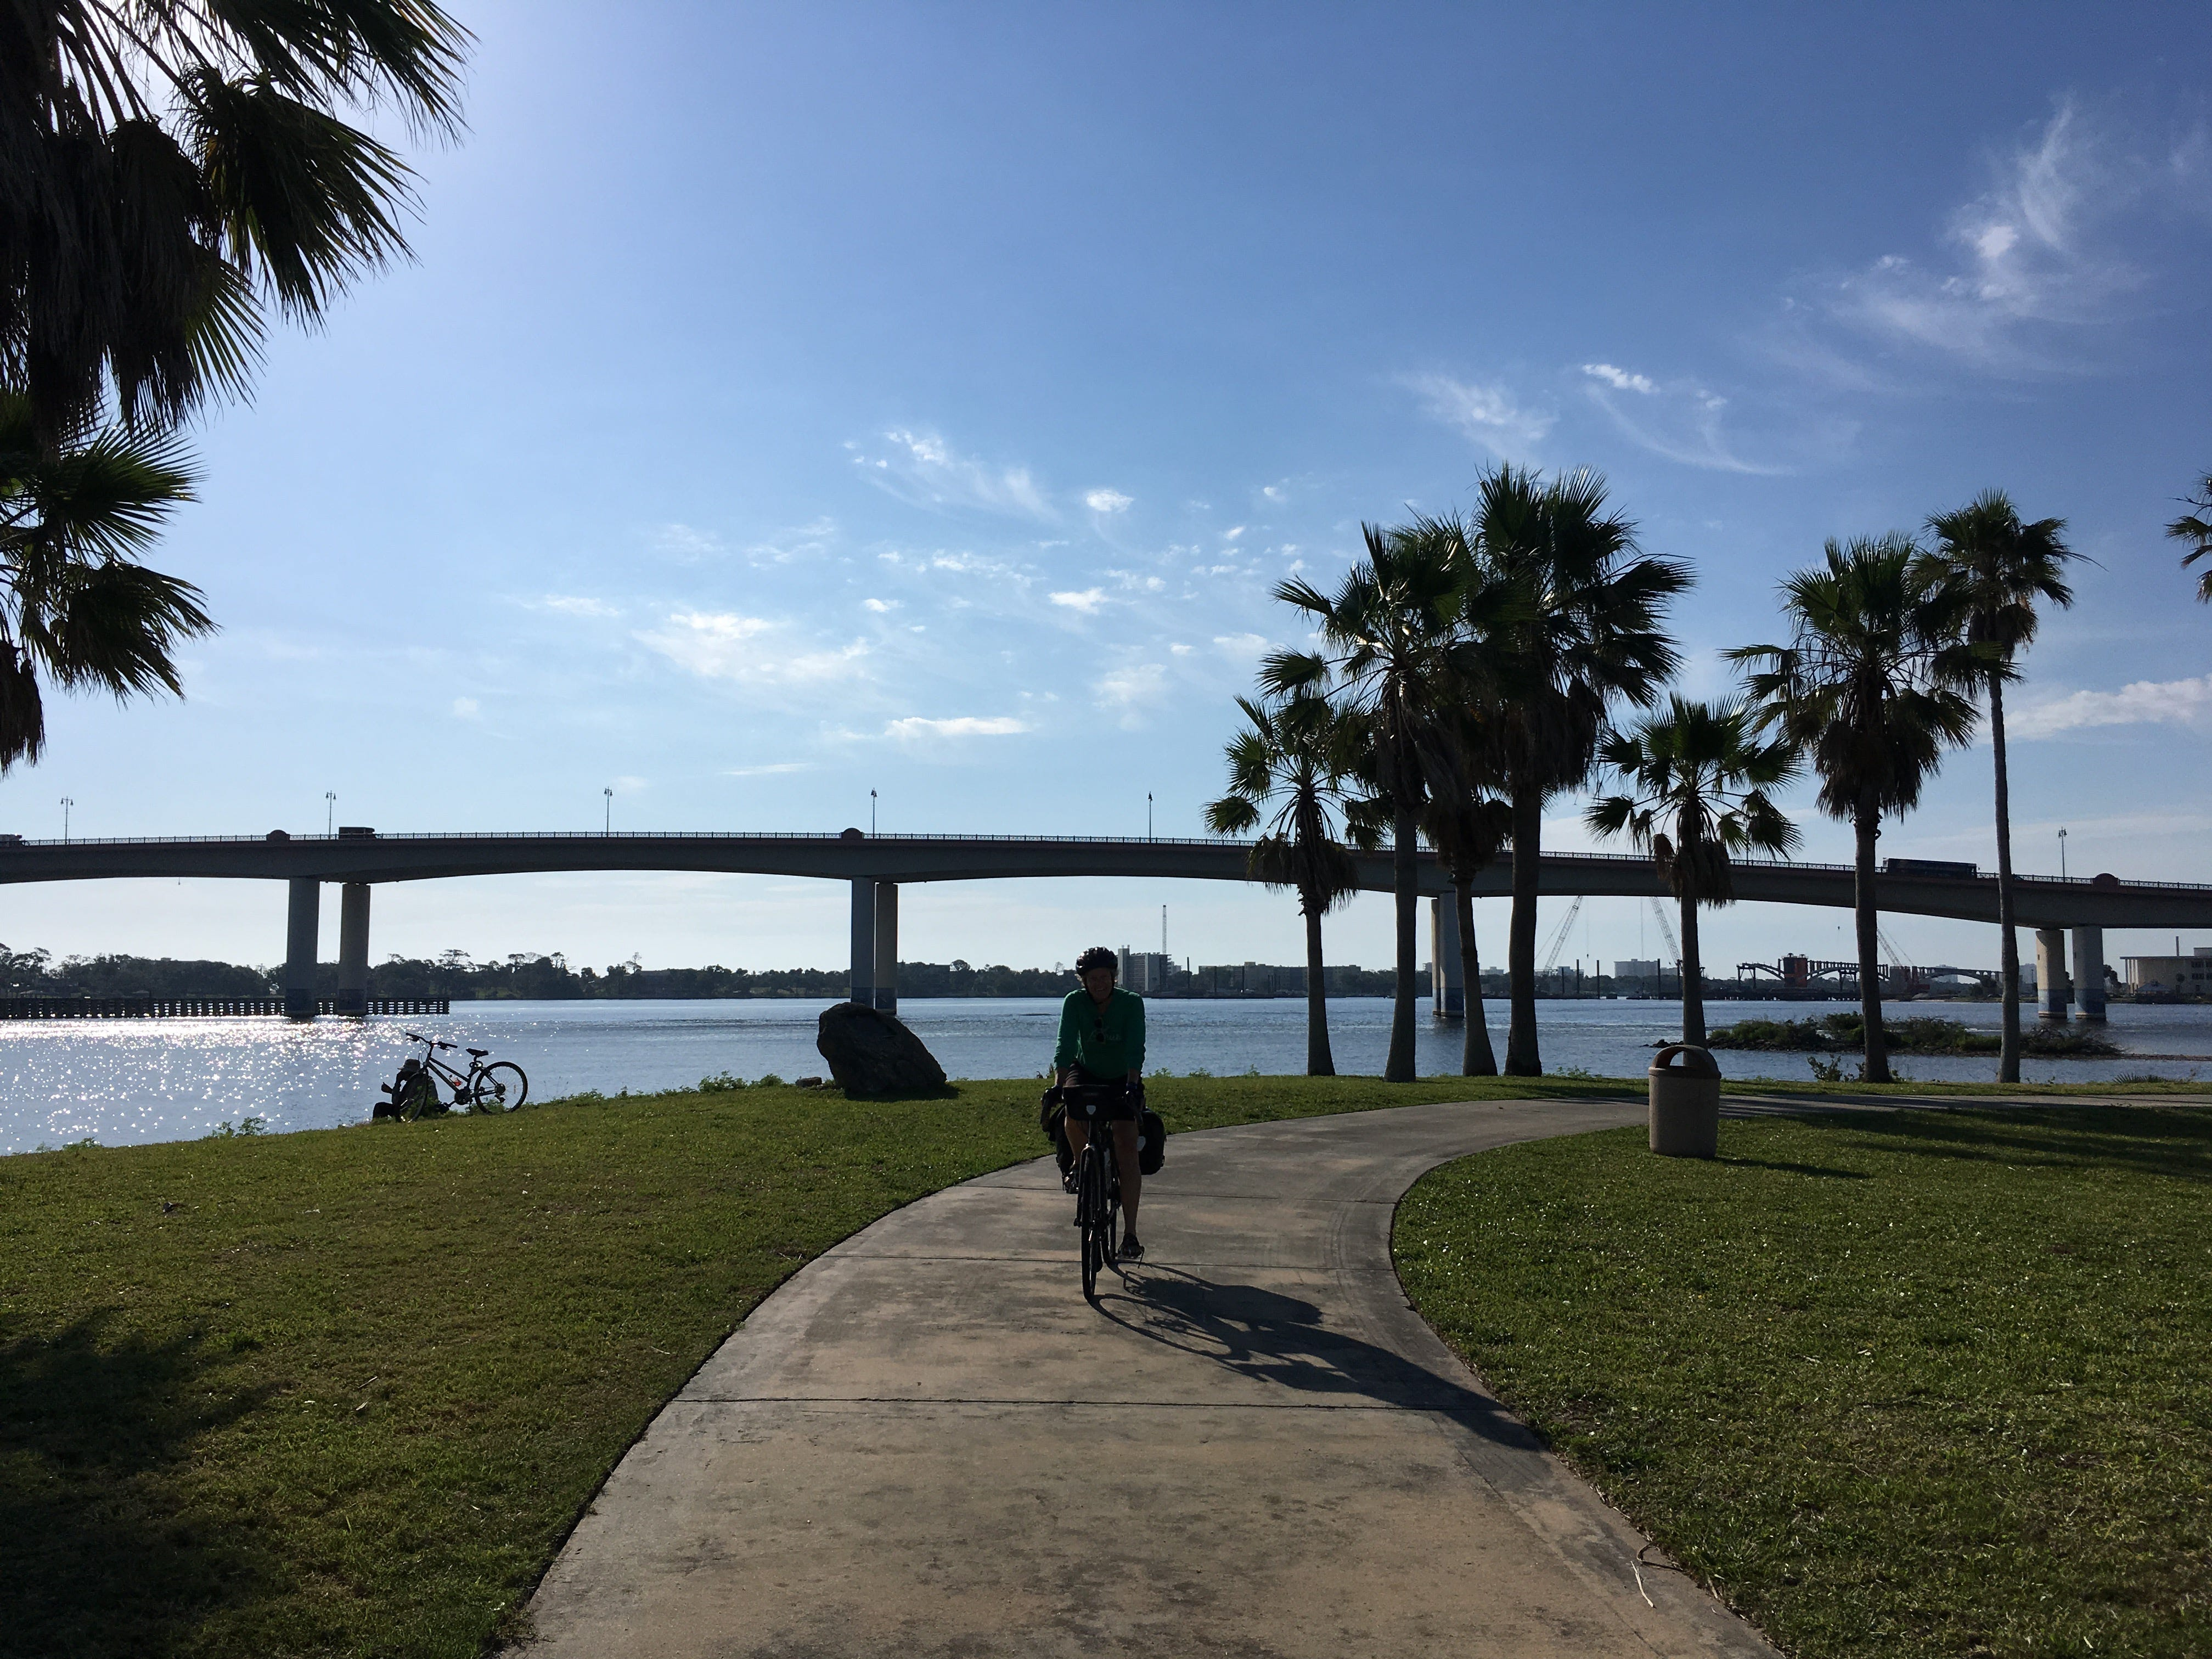 The Sweetheart Trail in Daytona Beach, Florida.